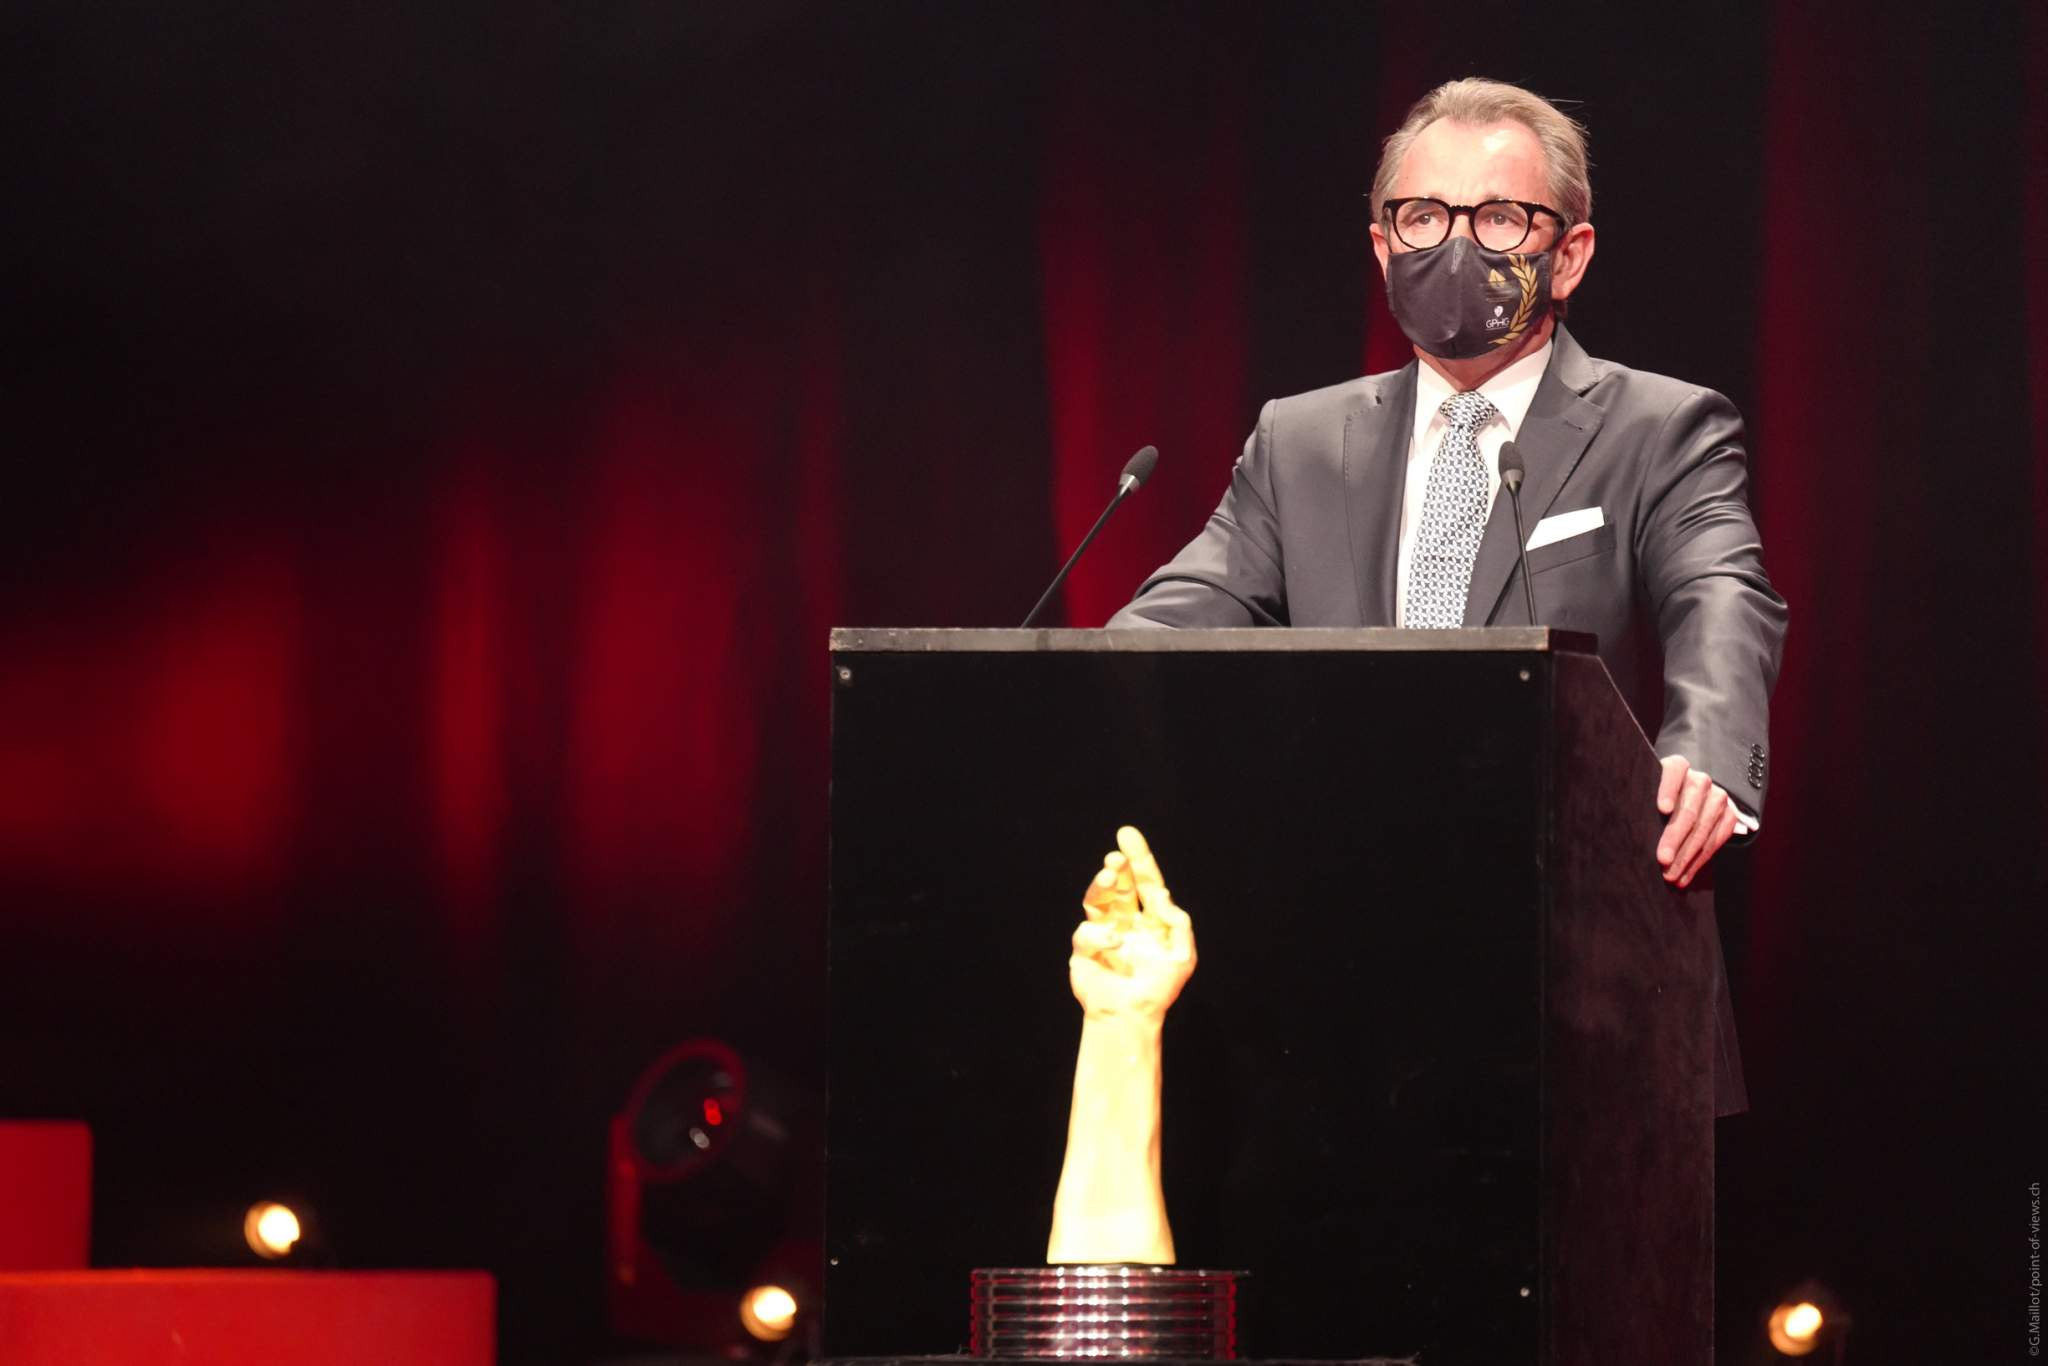 Raymond Loretan, Président de la Fondation du GPHG